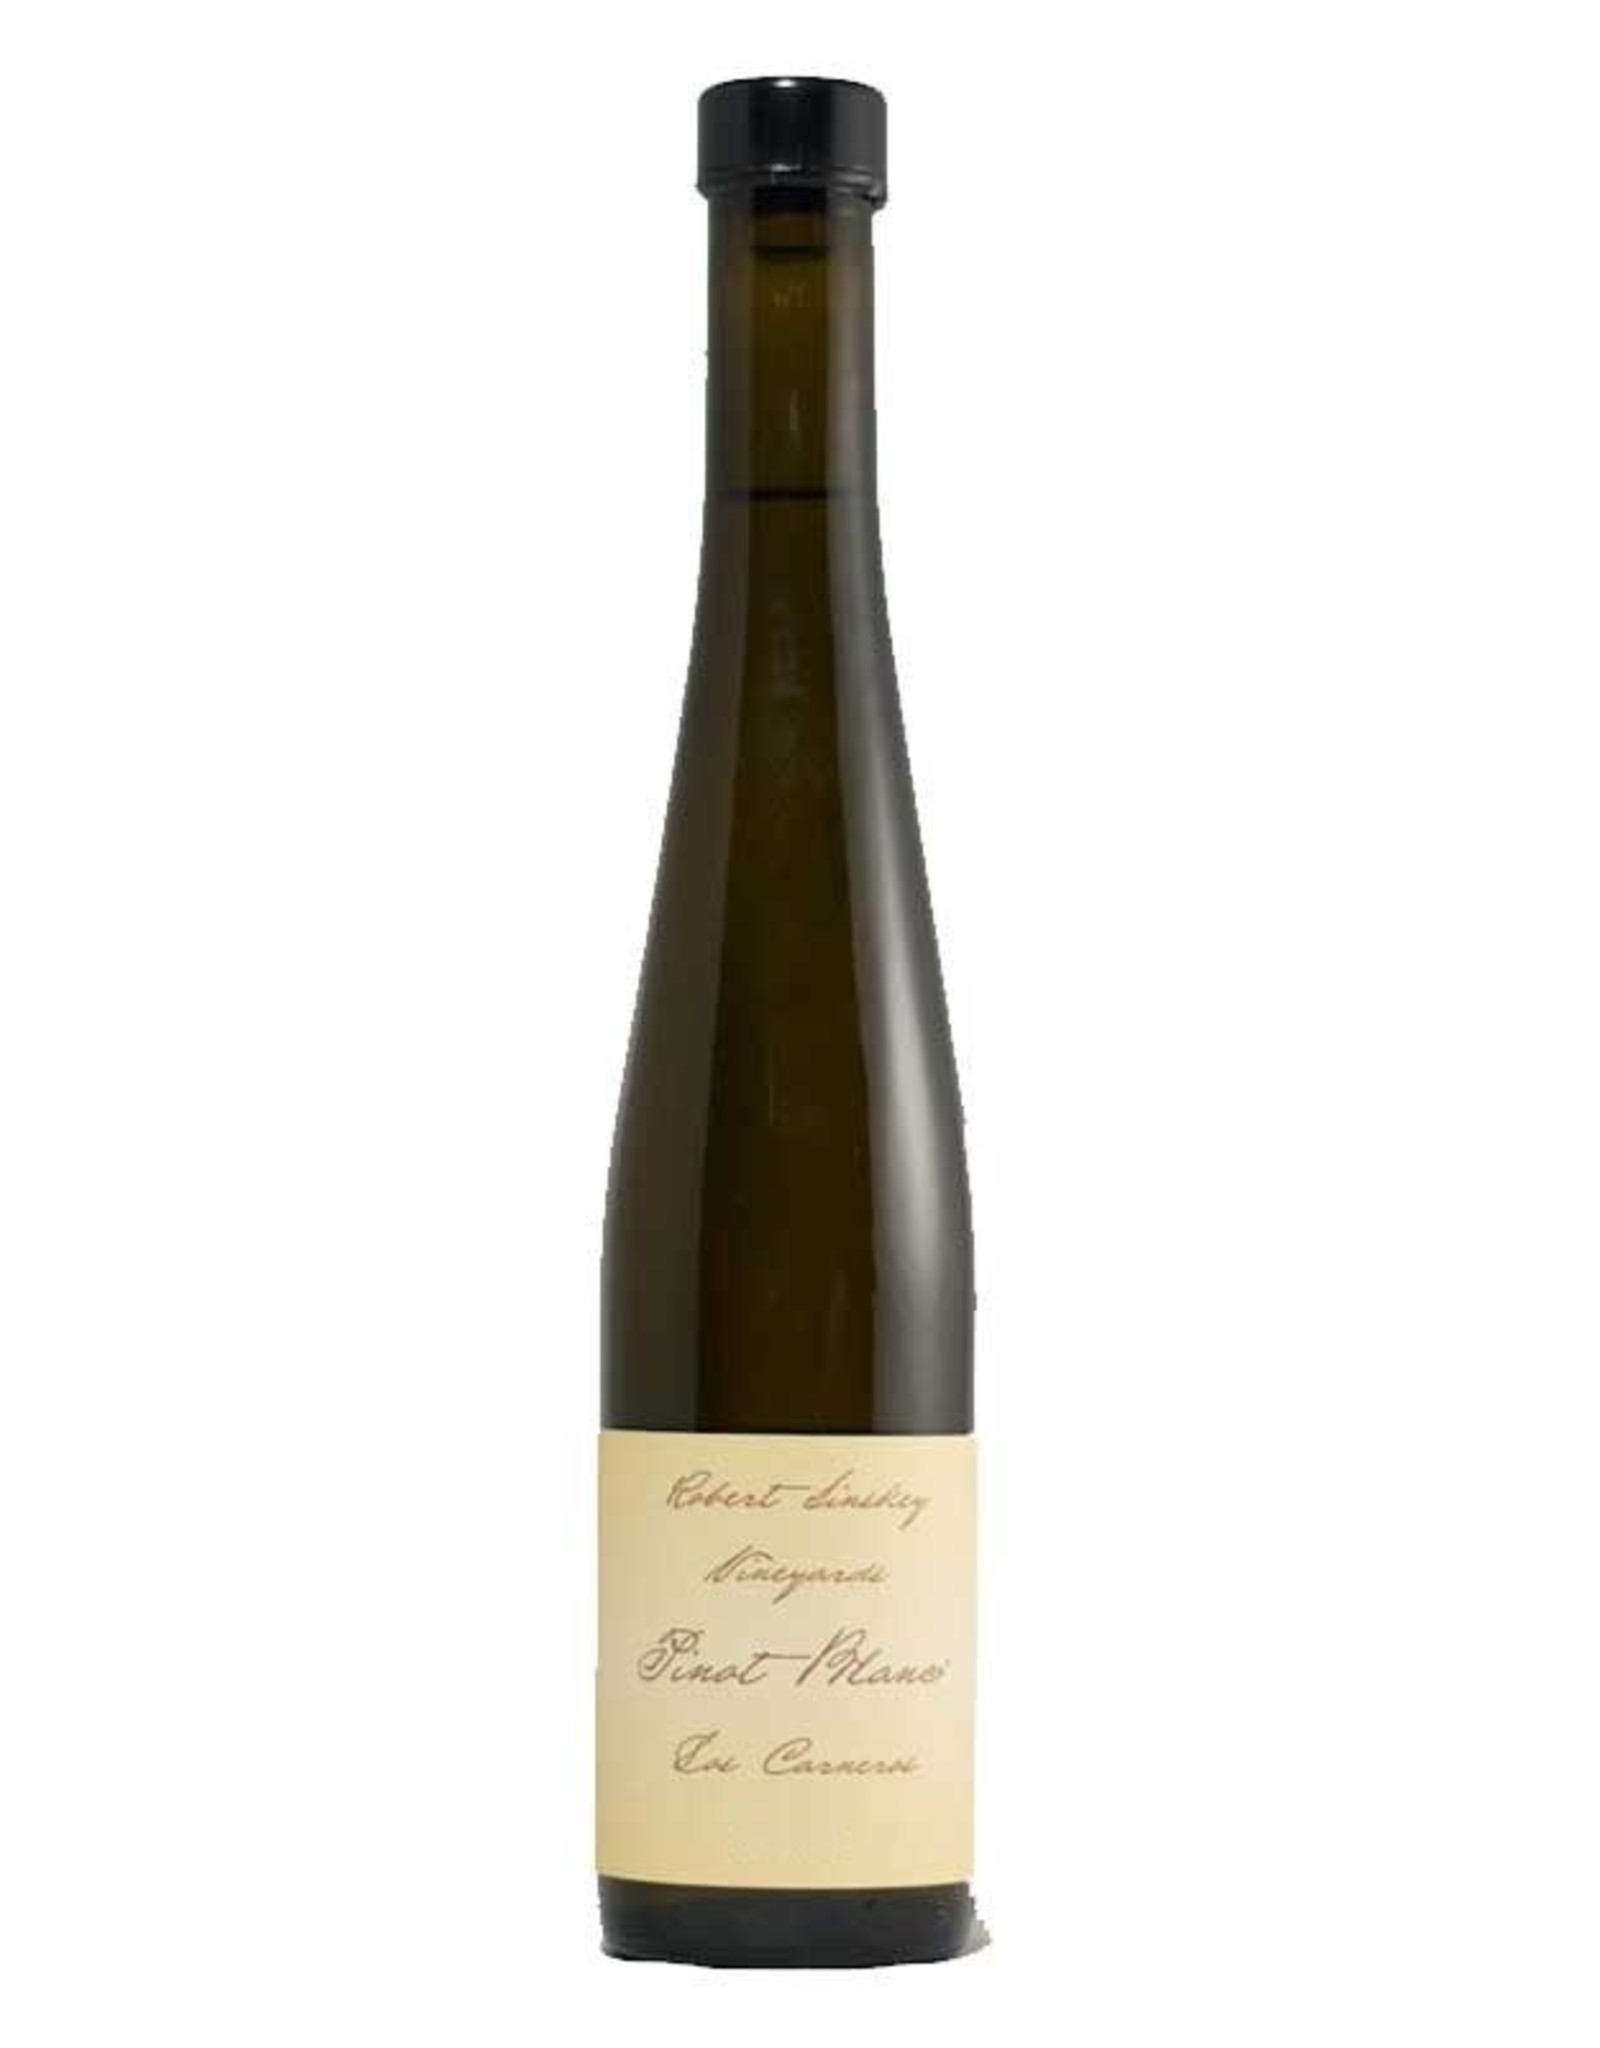 Robert Sinskey Pinot Blanc 2015